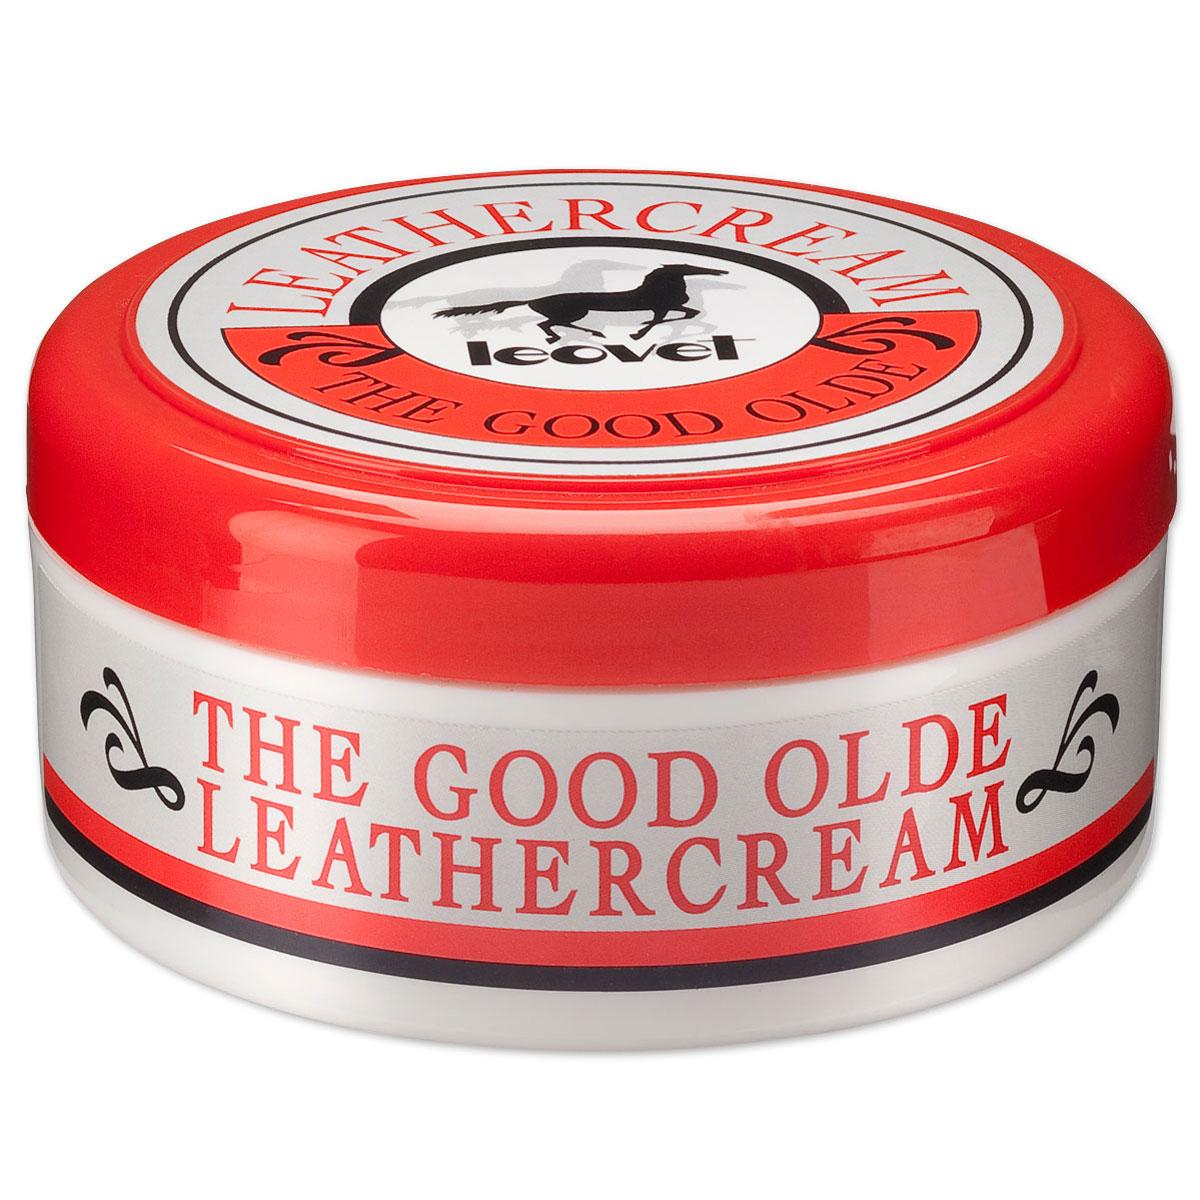 Leovet Good Olde Leather Cream